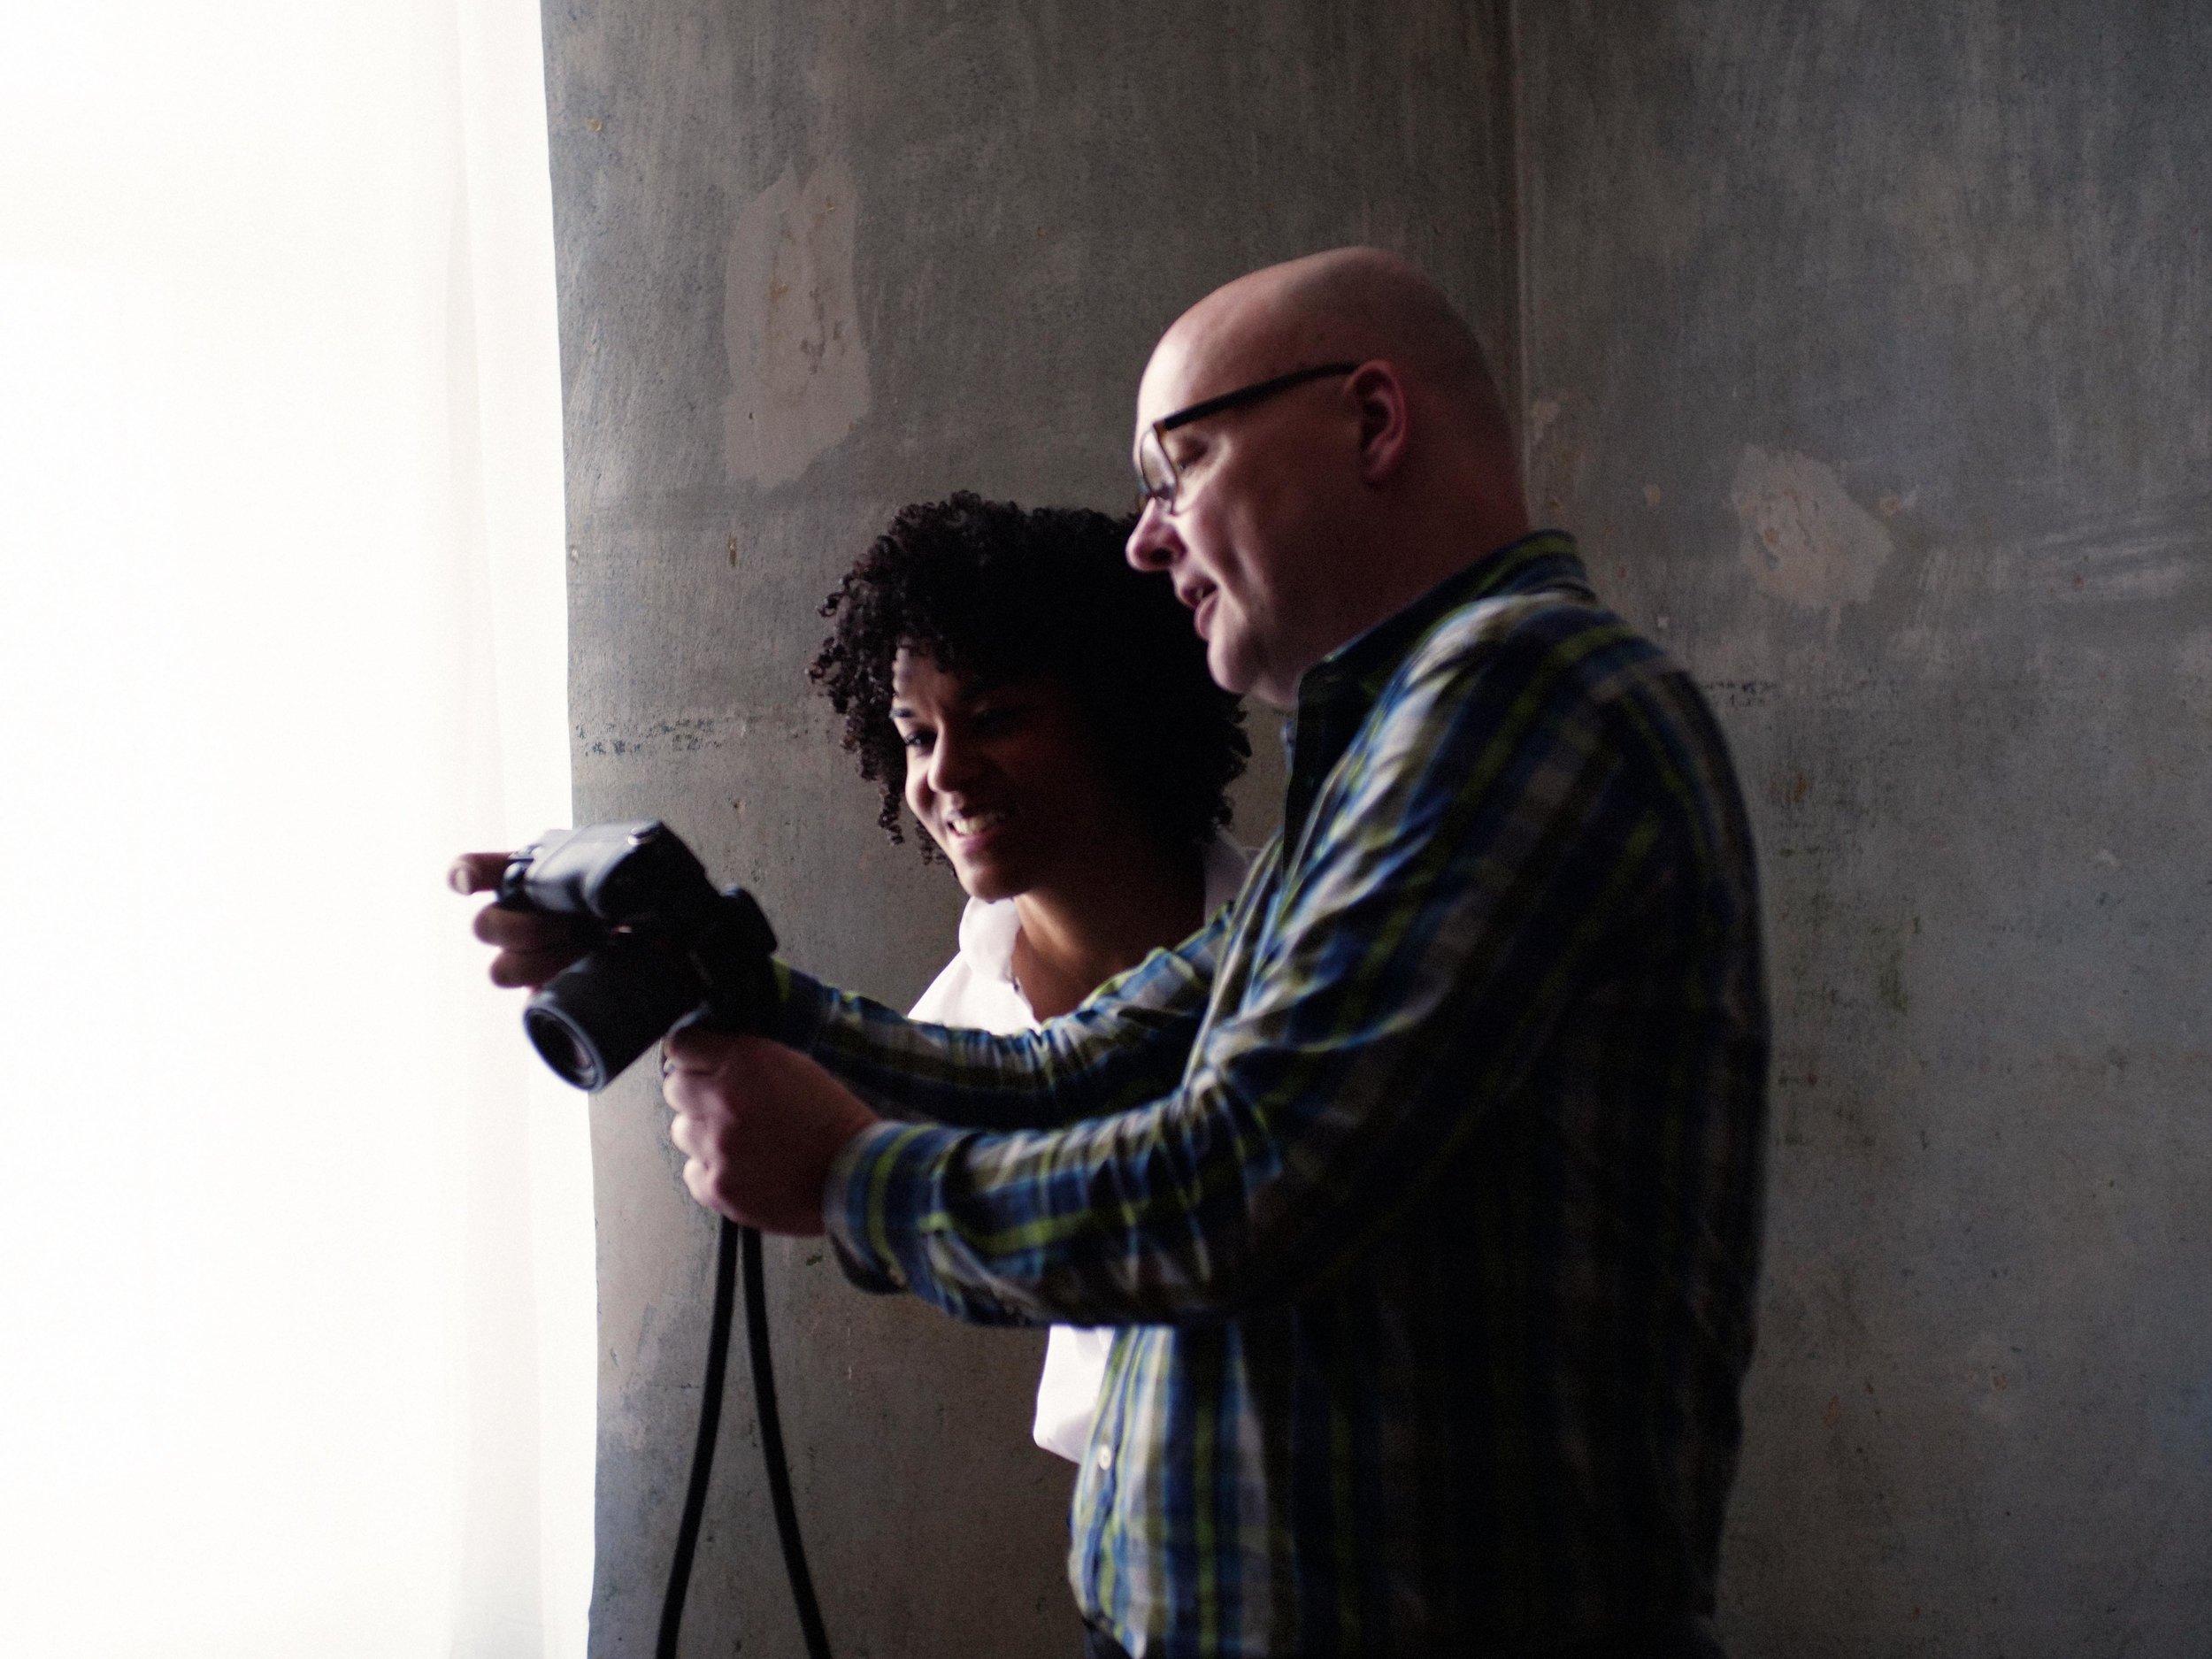 Fotograf Bonn Portrait Workshop Bonn Köln Fotostudio Portraitfotografie Fotokurs P1159756Exp.jpg